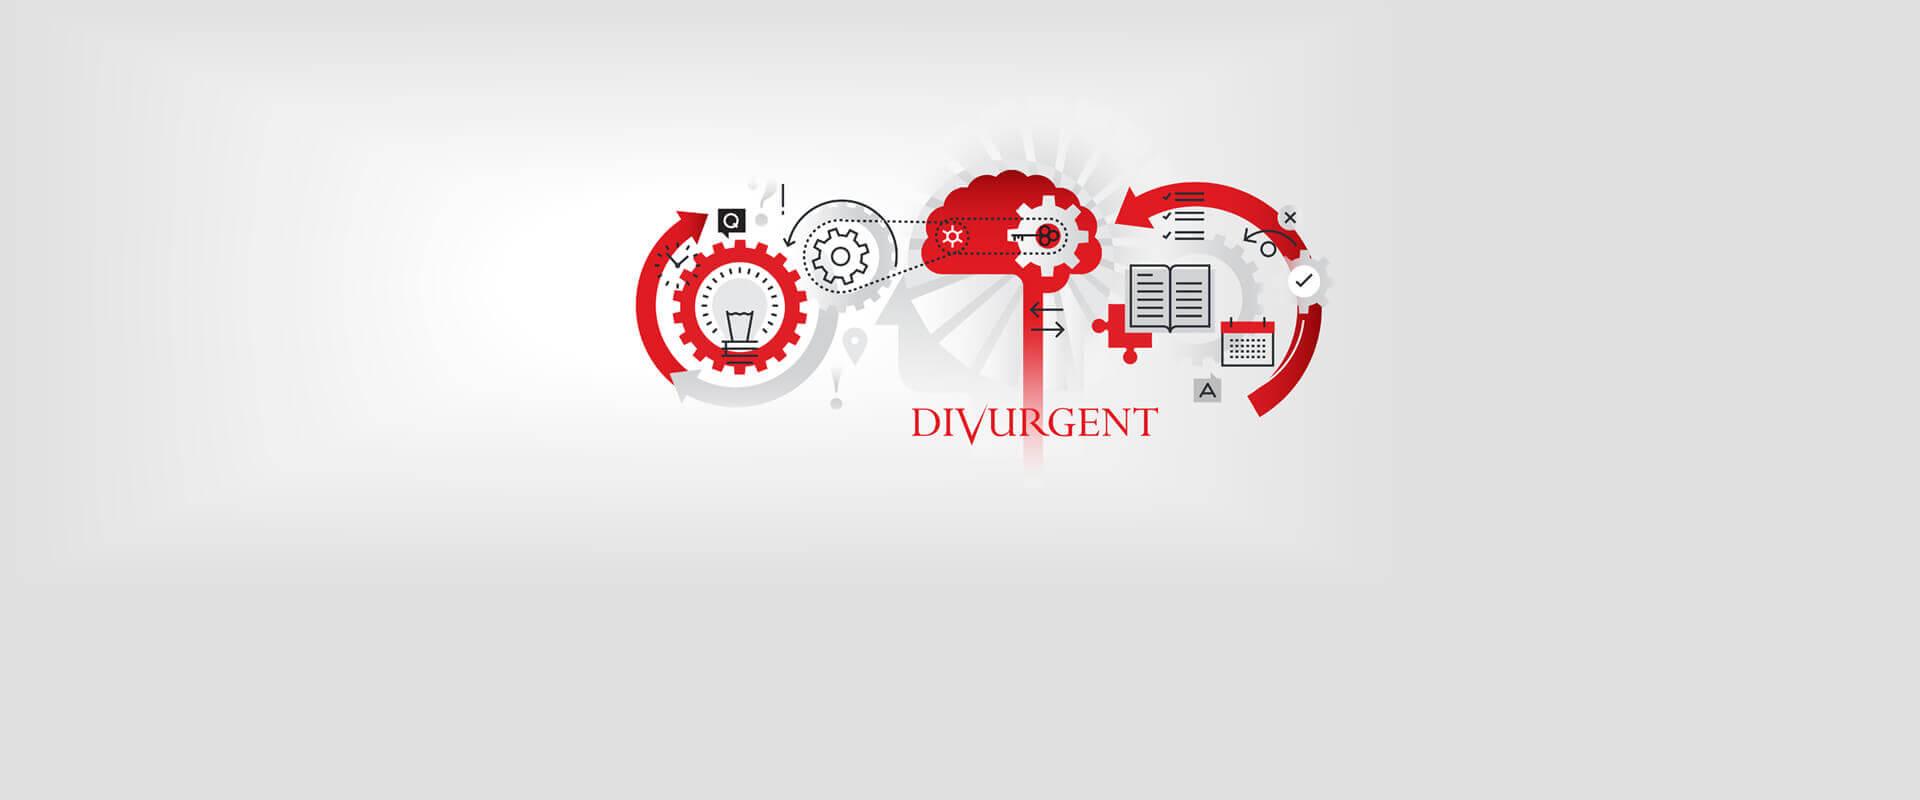 divurgent_services_banner_sm